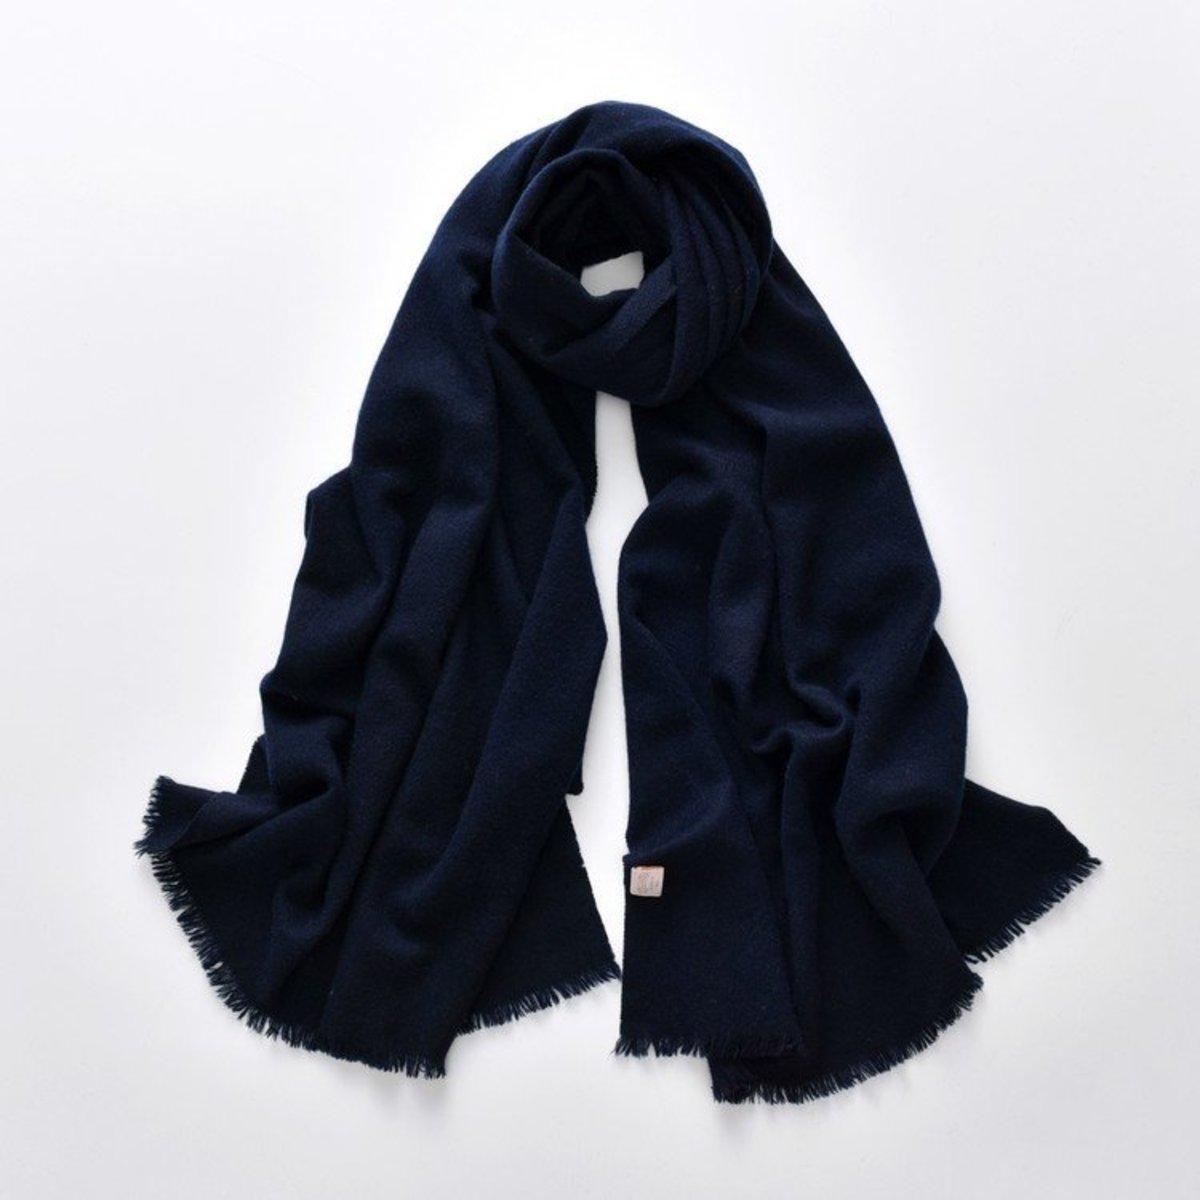 100% Cashmere Scarves (Navy)